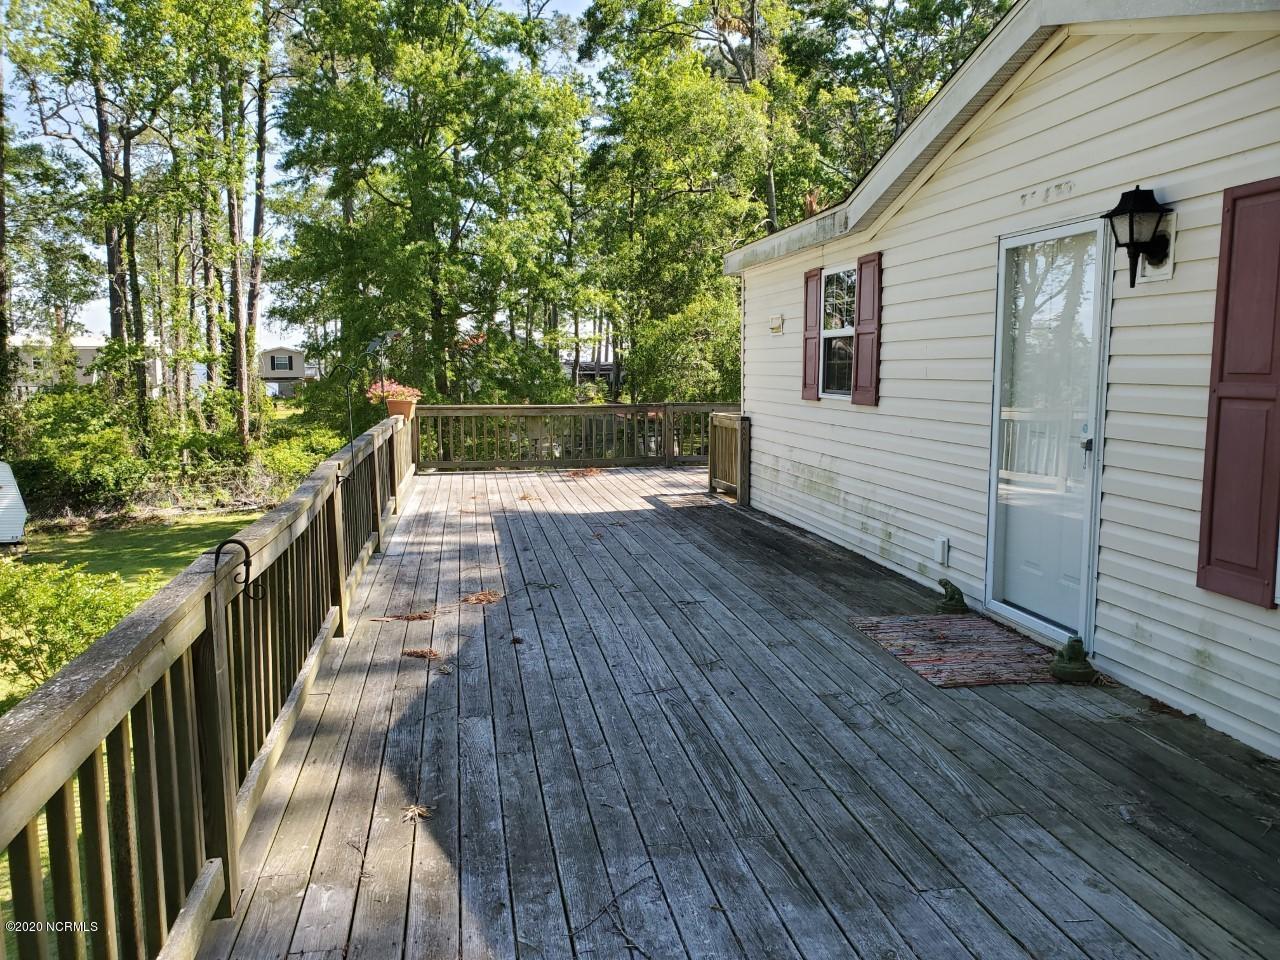 152 Lee Street, Aurora, North Carolina 27806, 2 Bedrooms Bedrooms, 5 Rooms Rooms,2 BathroomsBathrooms,Manufactured home,For sale,Lee,100217005